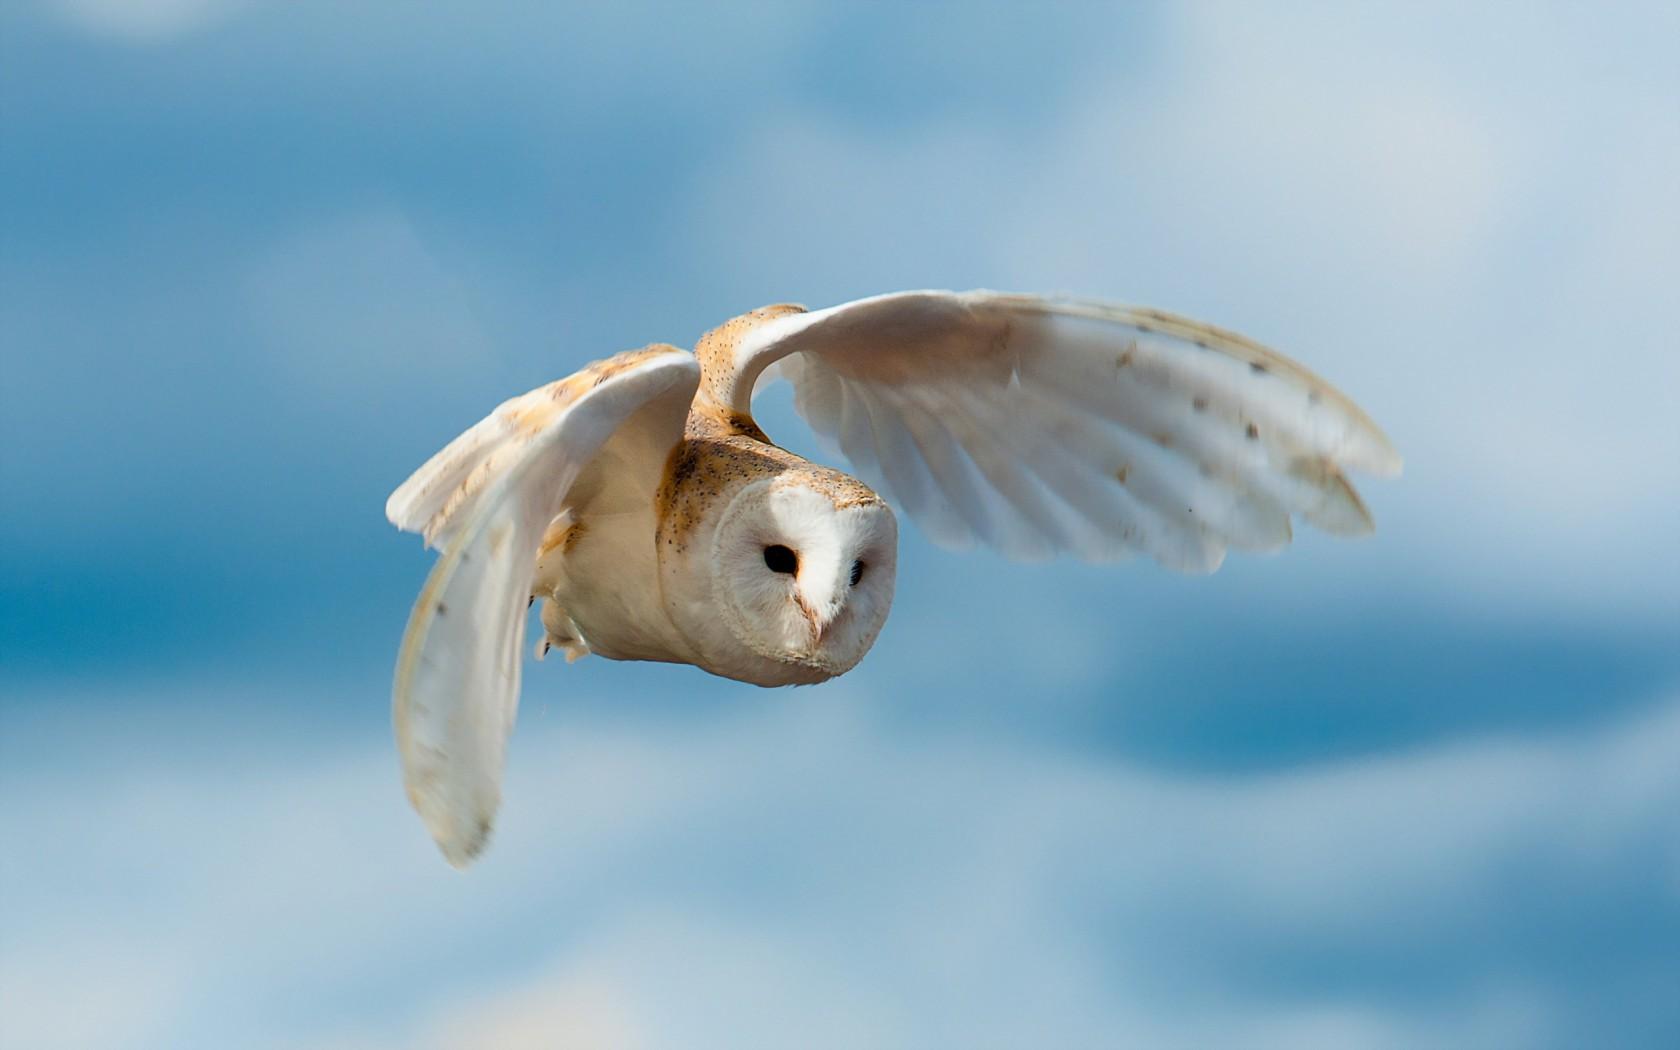 flying owl wallpaper background